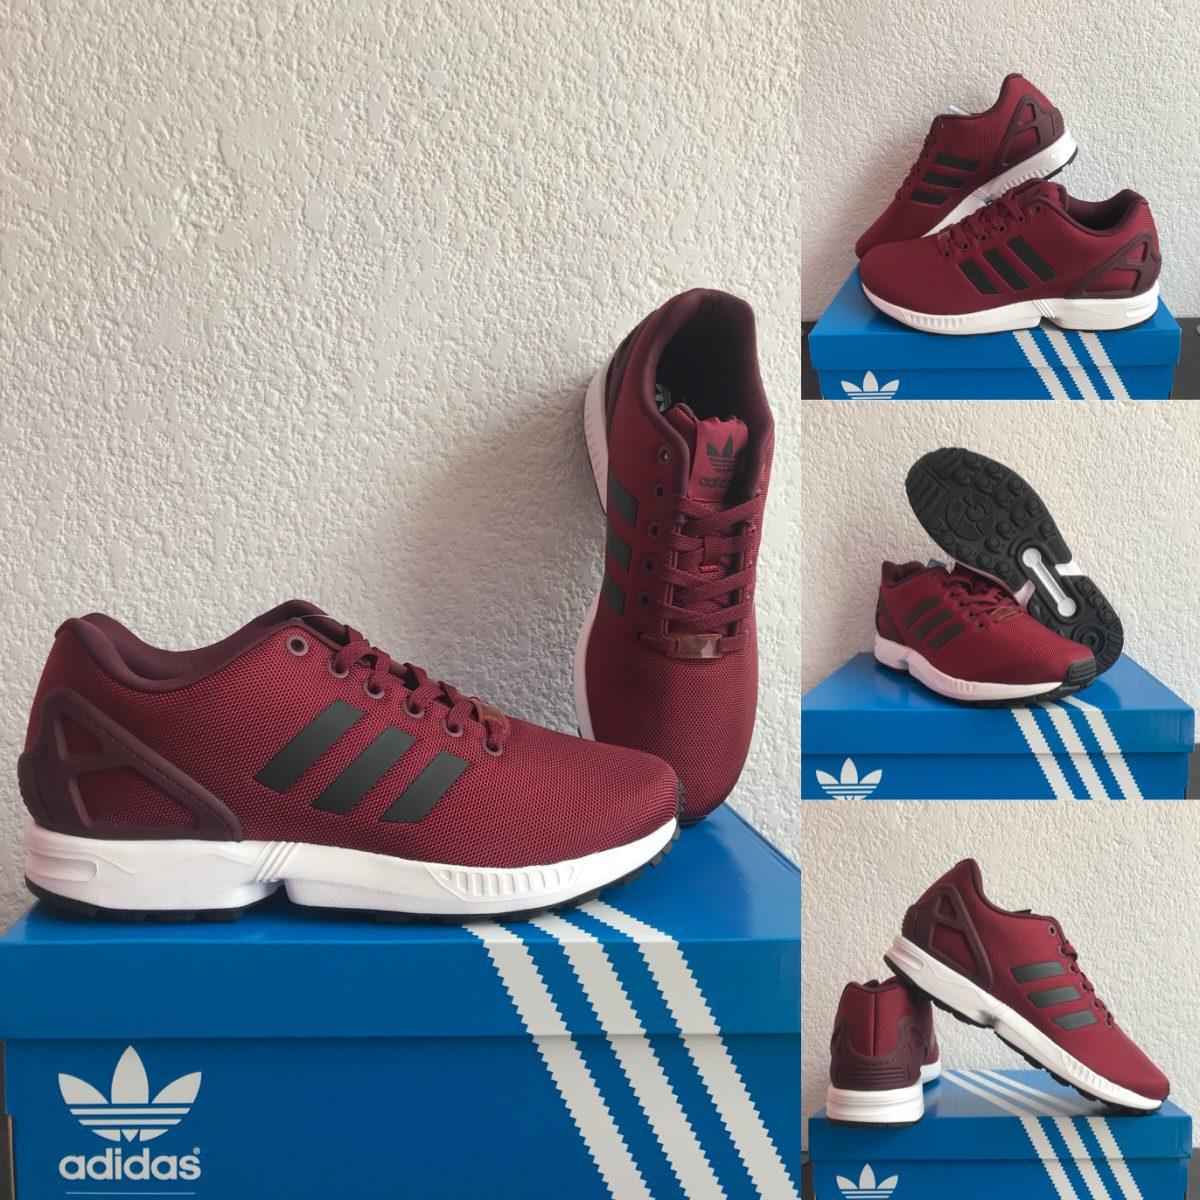 best sneakers c7bcc c546e tenis adidas zx flux vino.talla 6. originales. Cargando zoom.